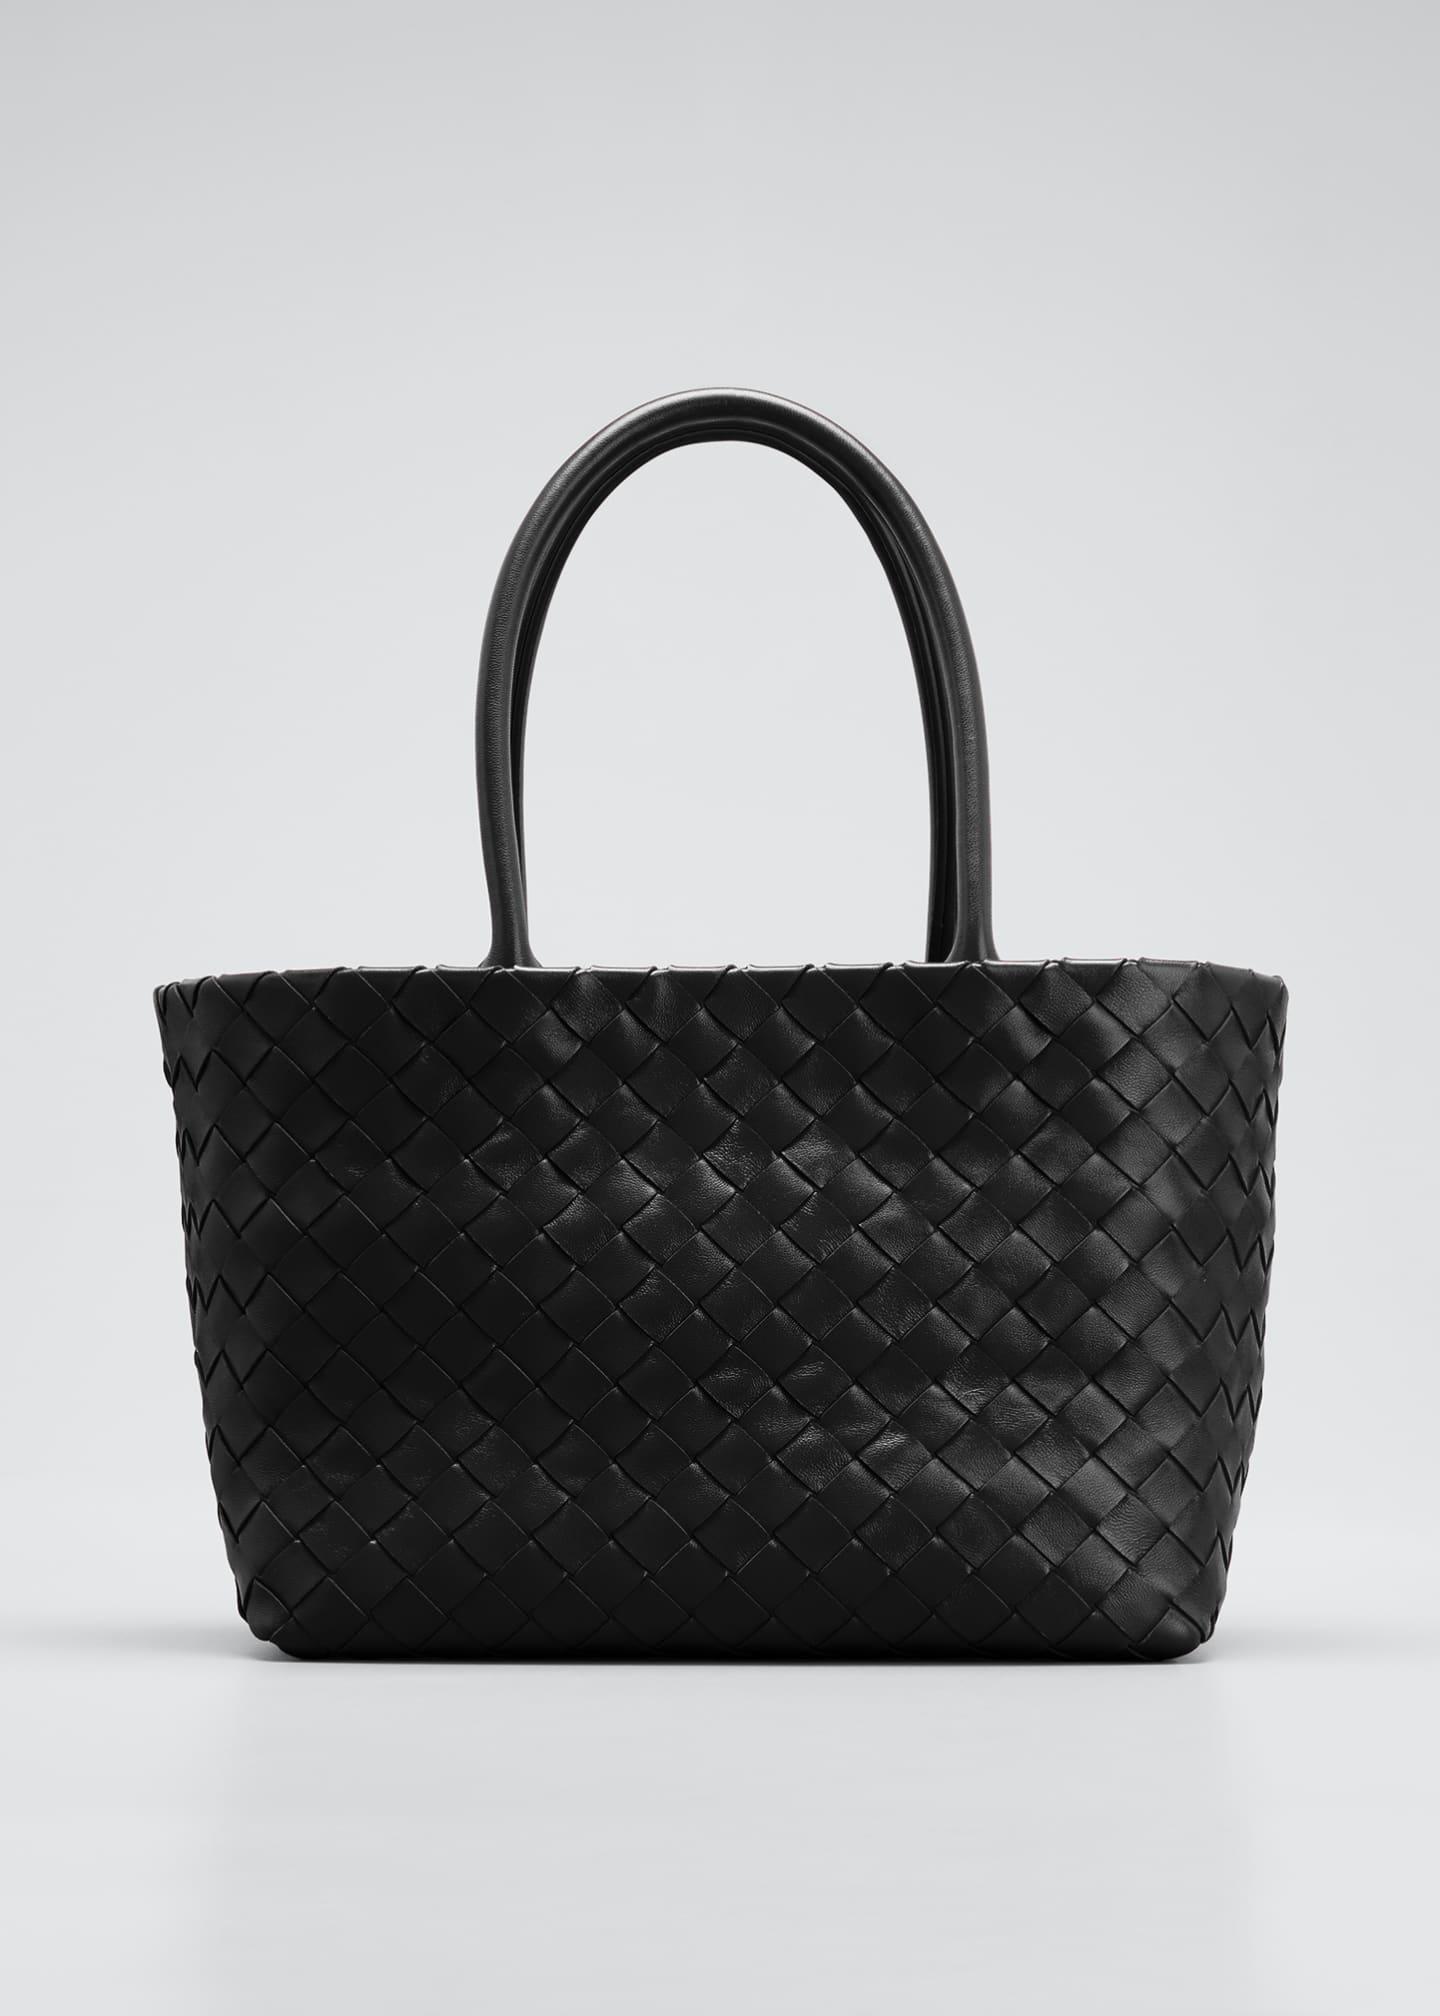 Bottega Veneta Mini Woven Top Handle Bag